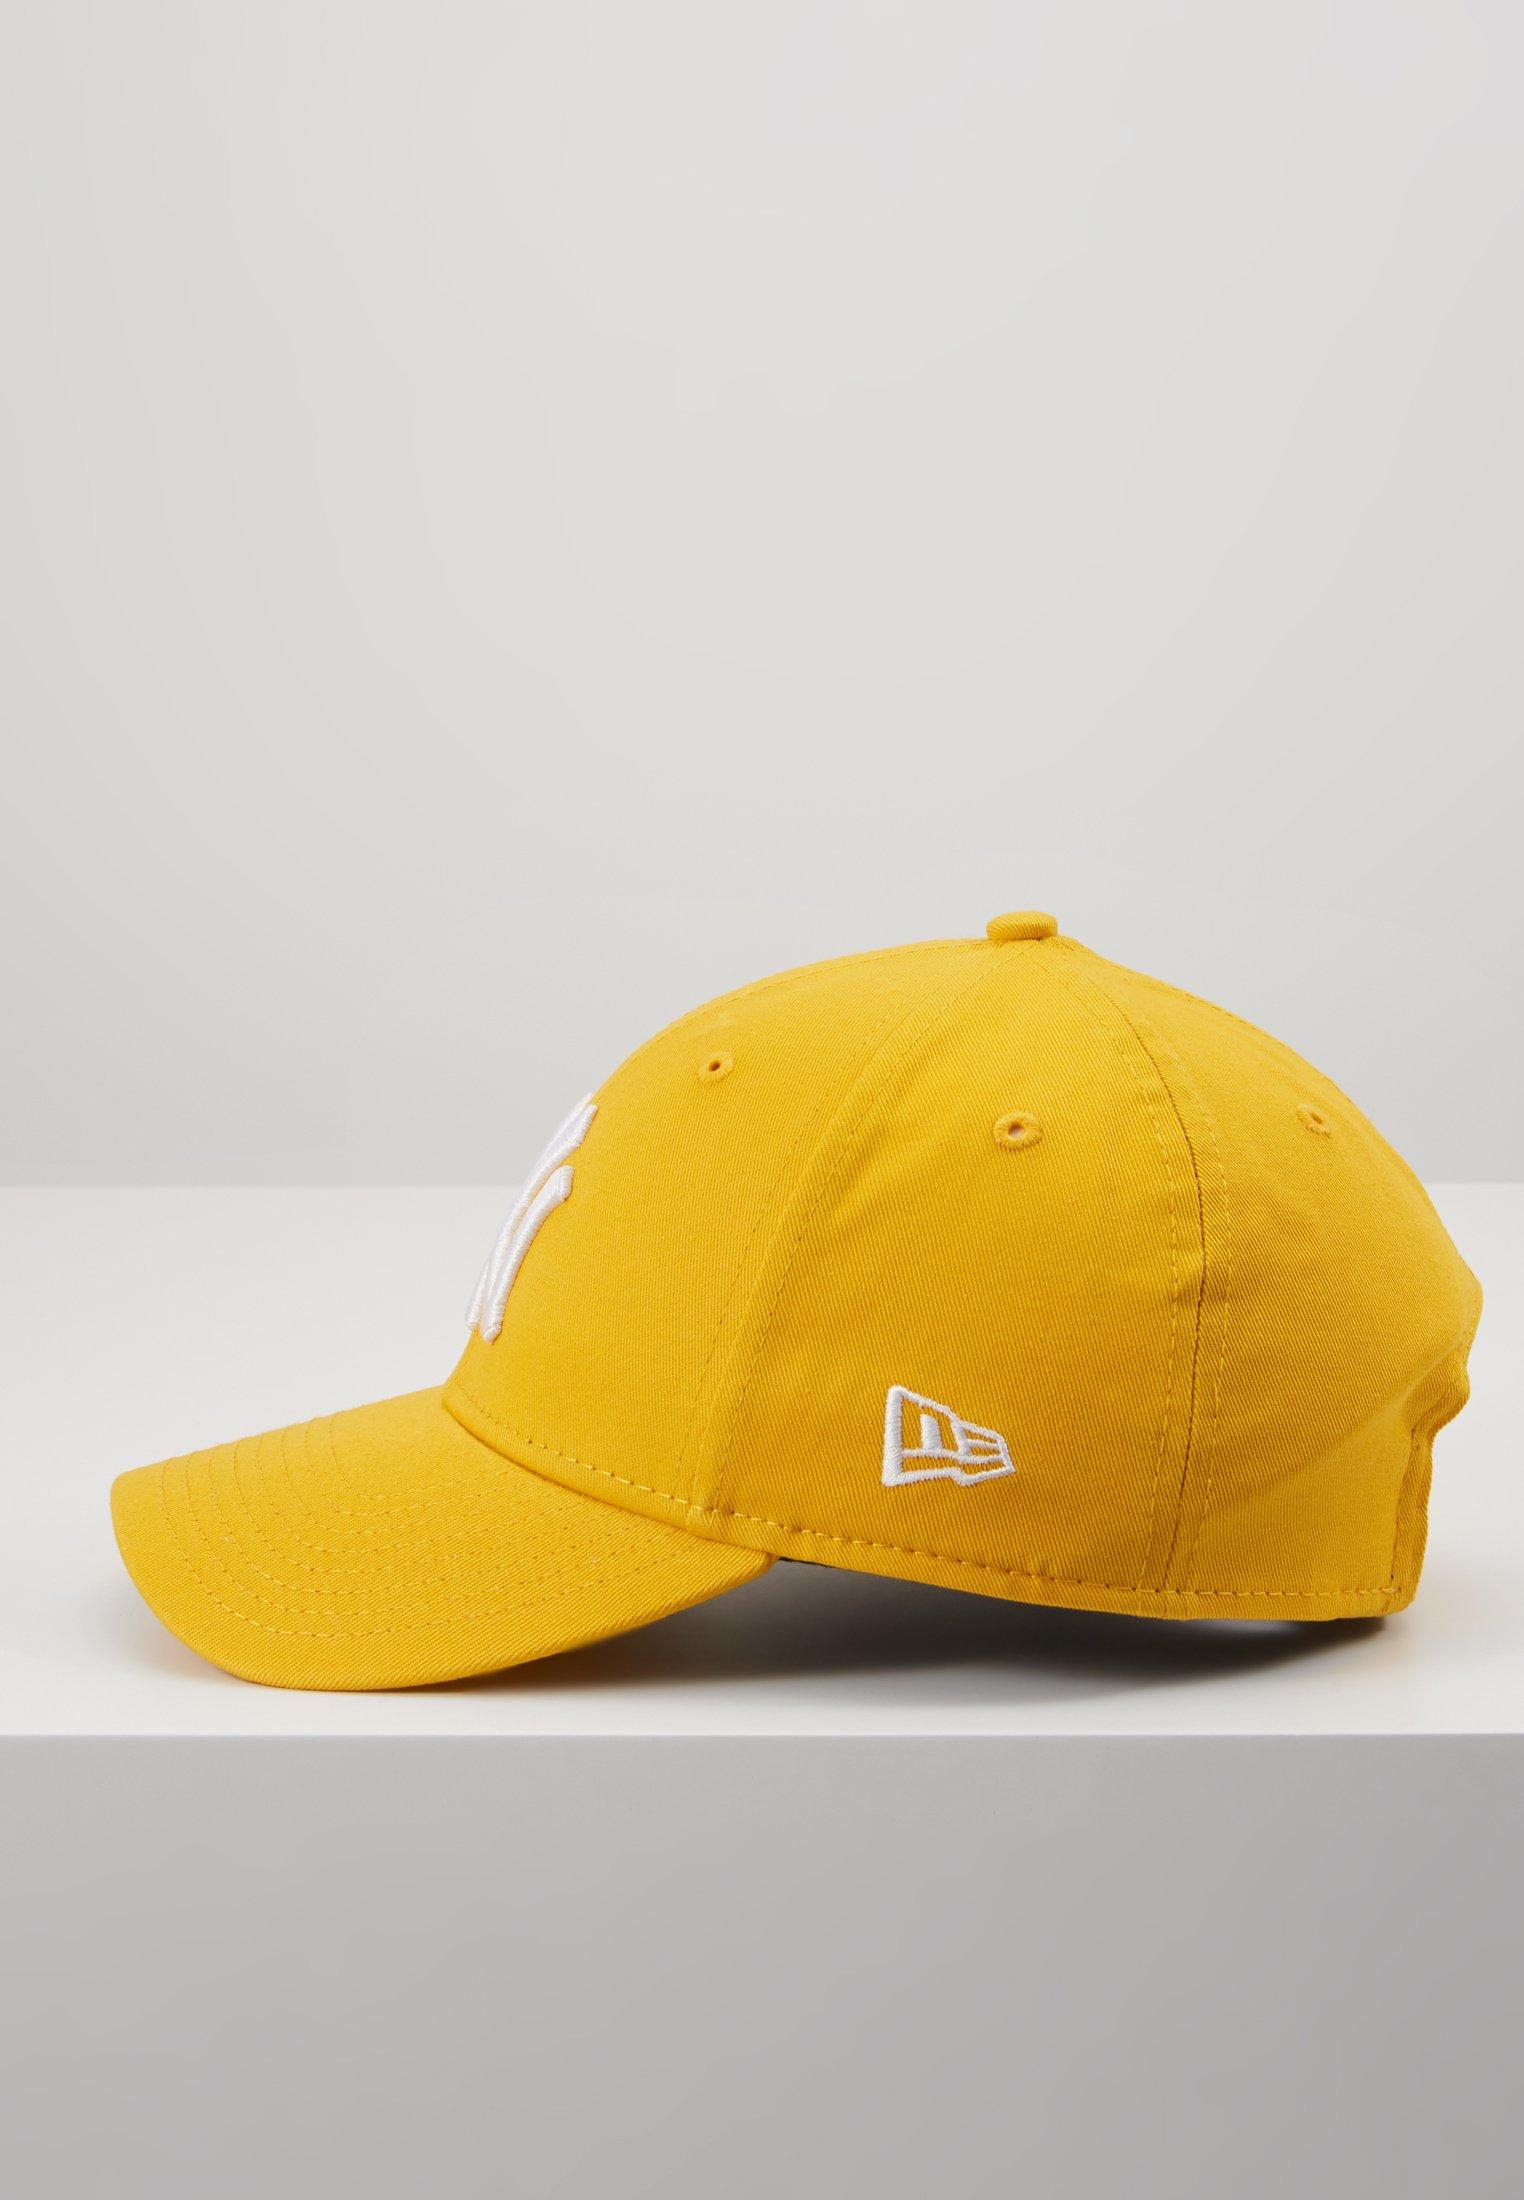 New Era ESSENTIAL - Cap - yellow/gul IktBQNWwZfIGBOv